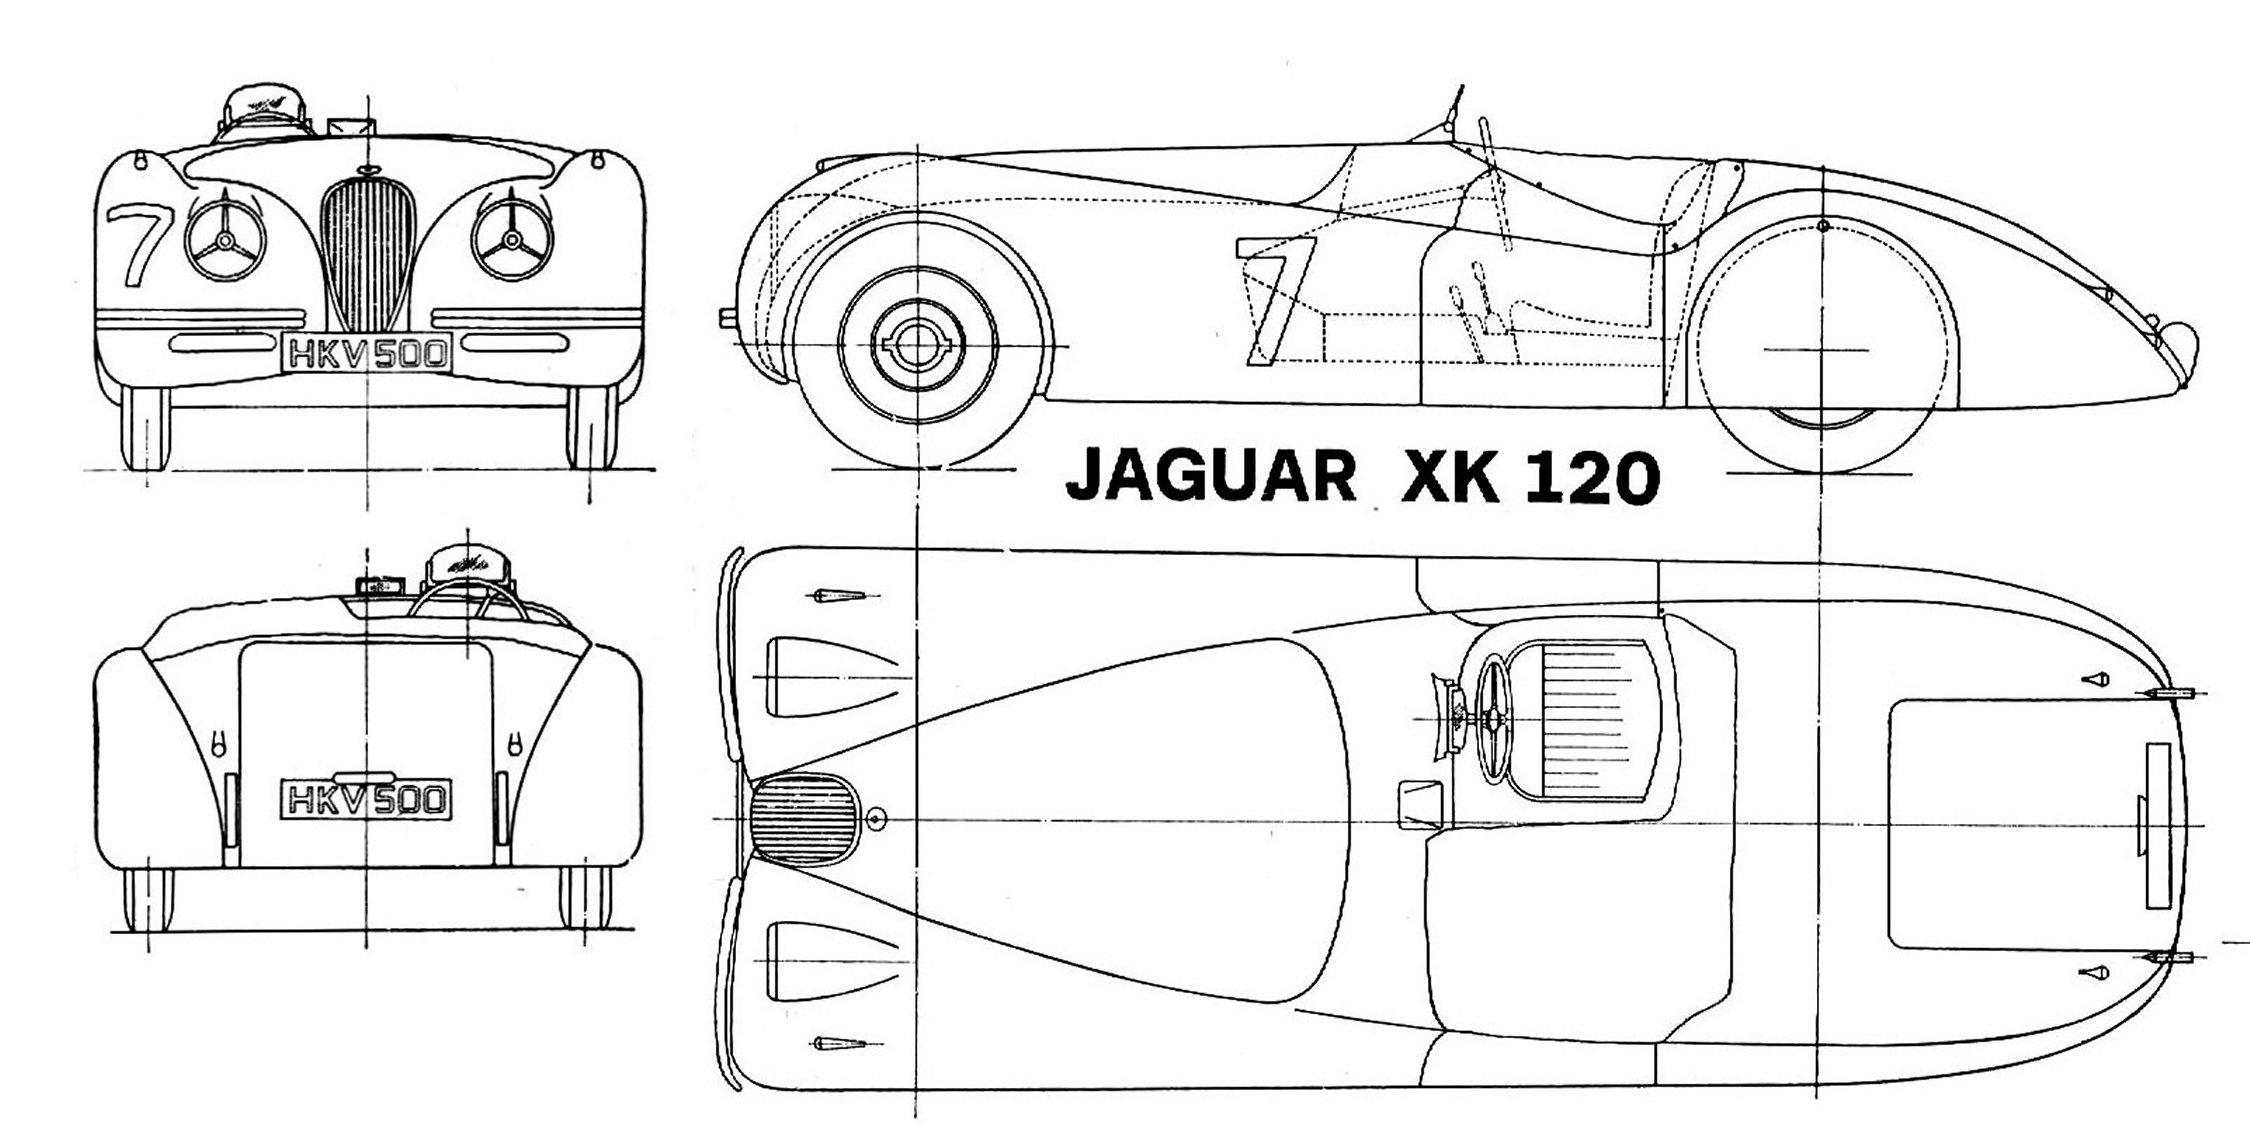 Jaguar XK120 blueprint